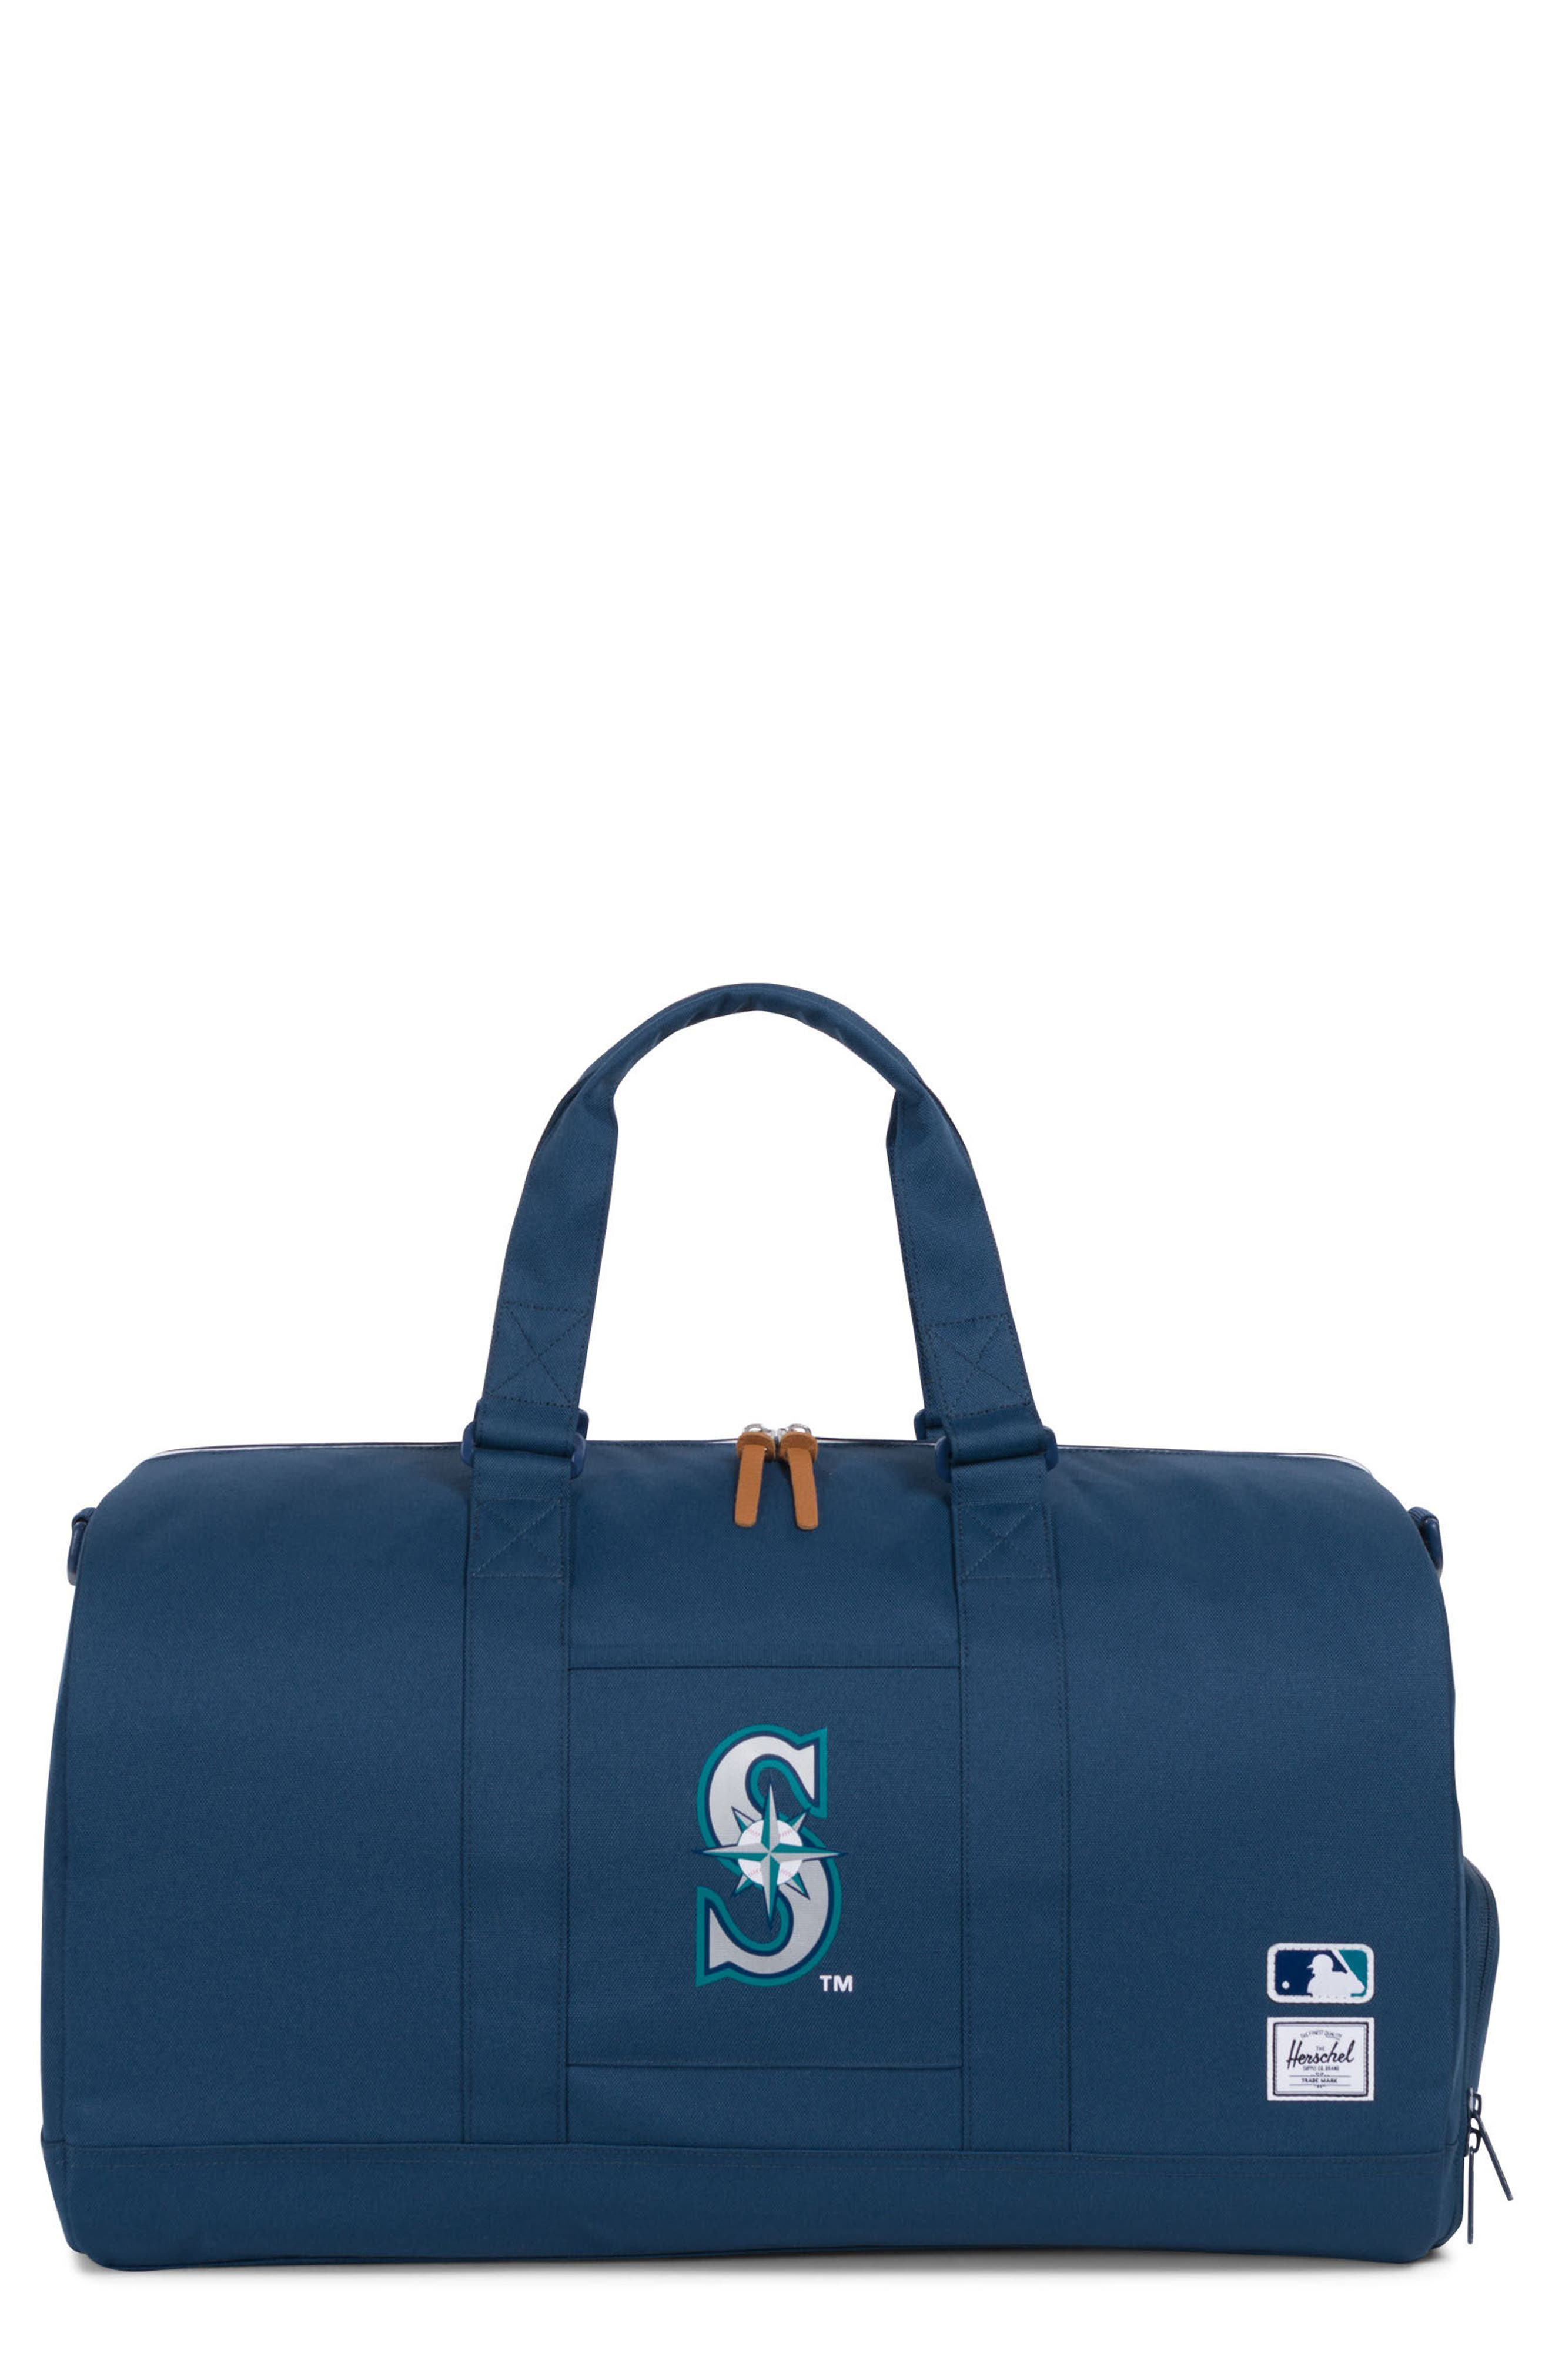 Novel - MLB American League Duffel Bag,                         Main,                         color, SEATTLE MARINERS